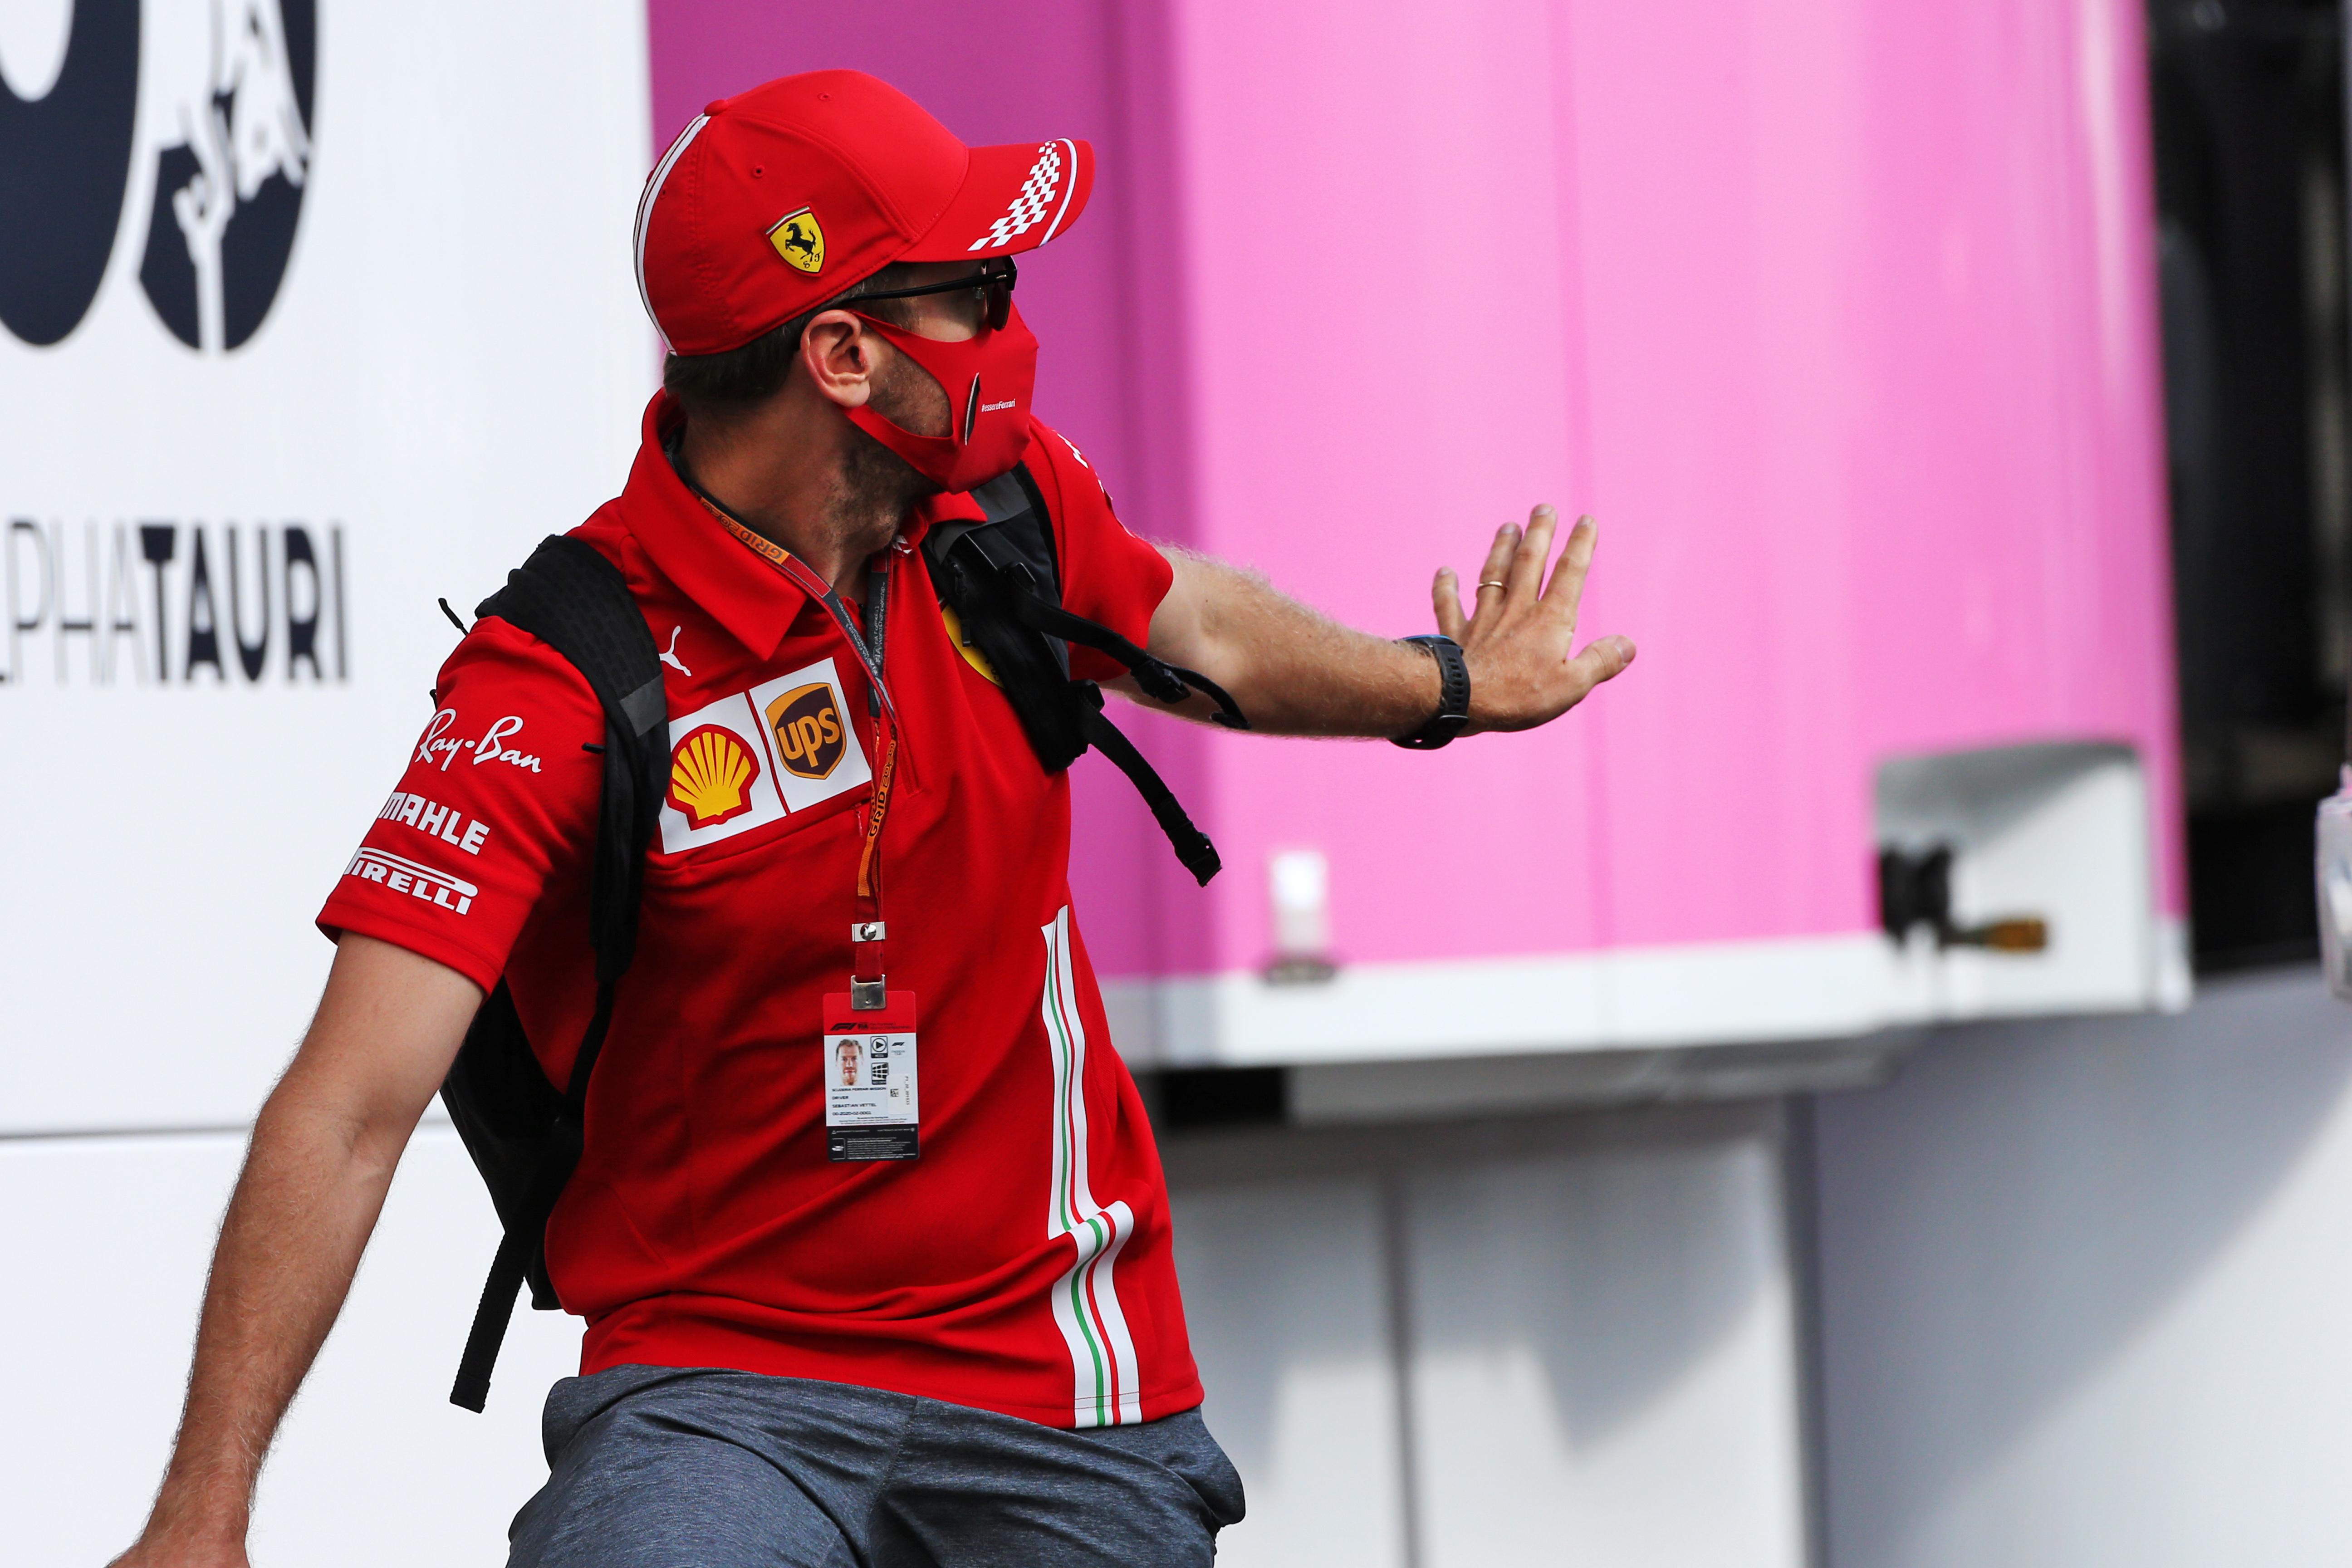 Motor Racing Formula One World Championship Tuscan Grand Prix Preparation Day Mugello, Italy